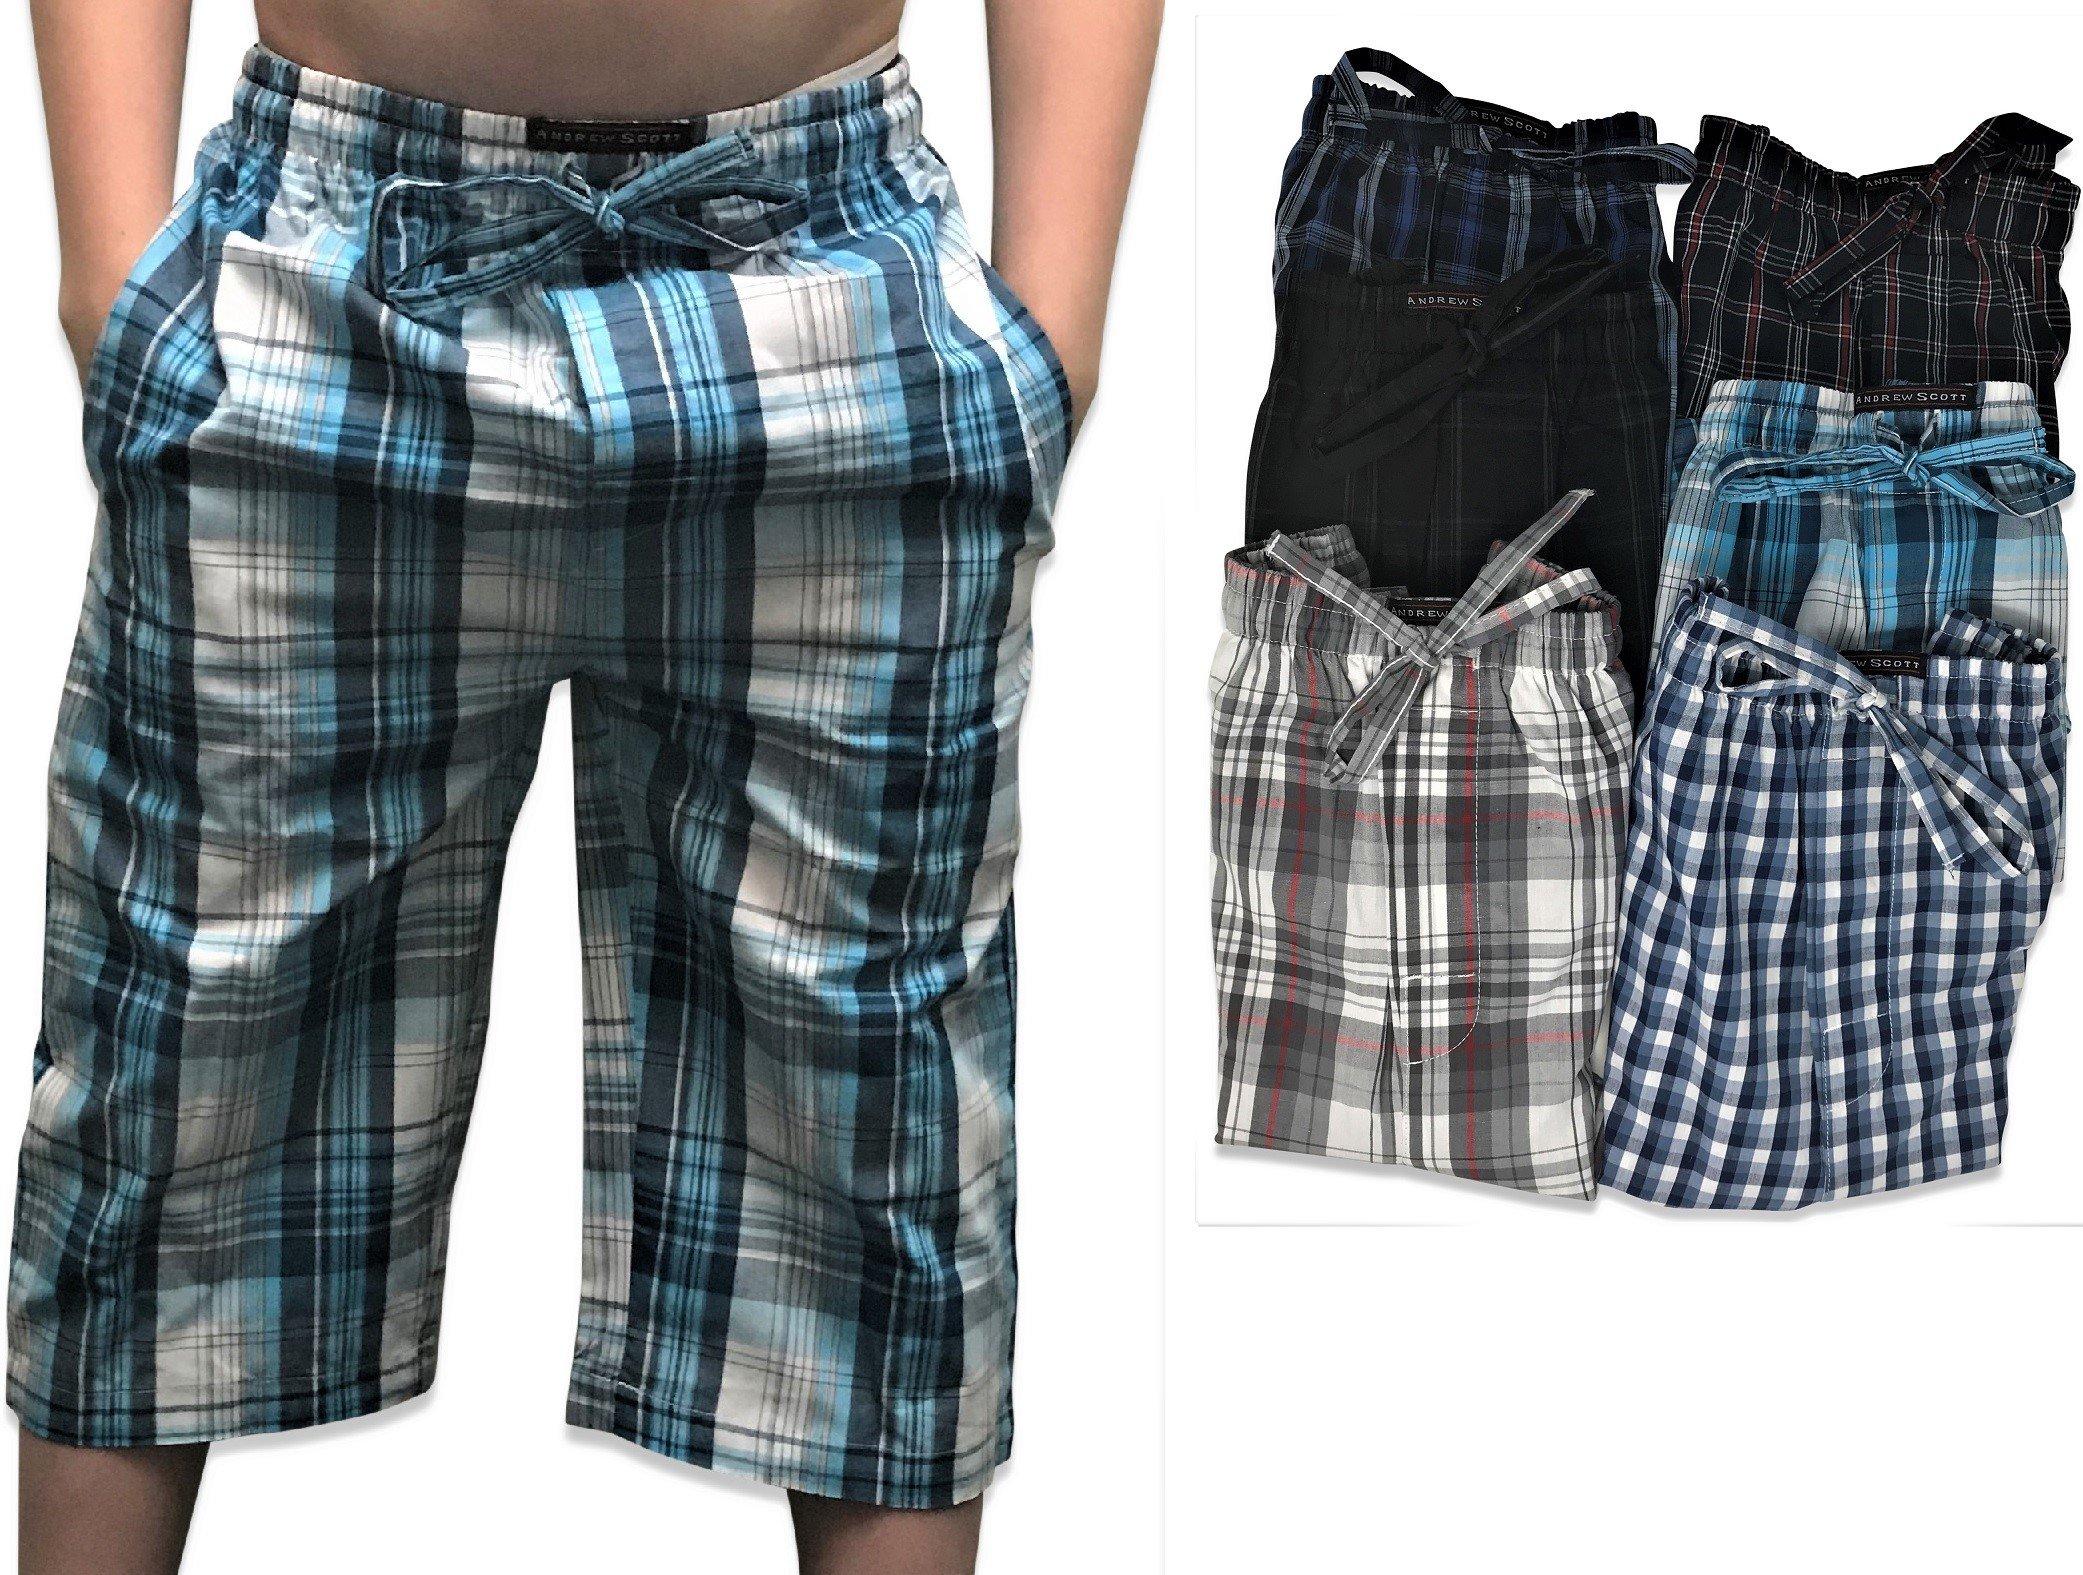 Andrew Scott Boy's 6 Pack Woven Jam 3/4 Length Jog Shorts Pant (6 Pack - Assorted Classic Plaids, Small)